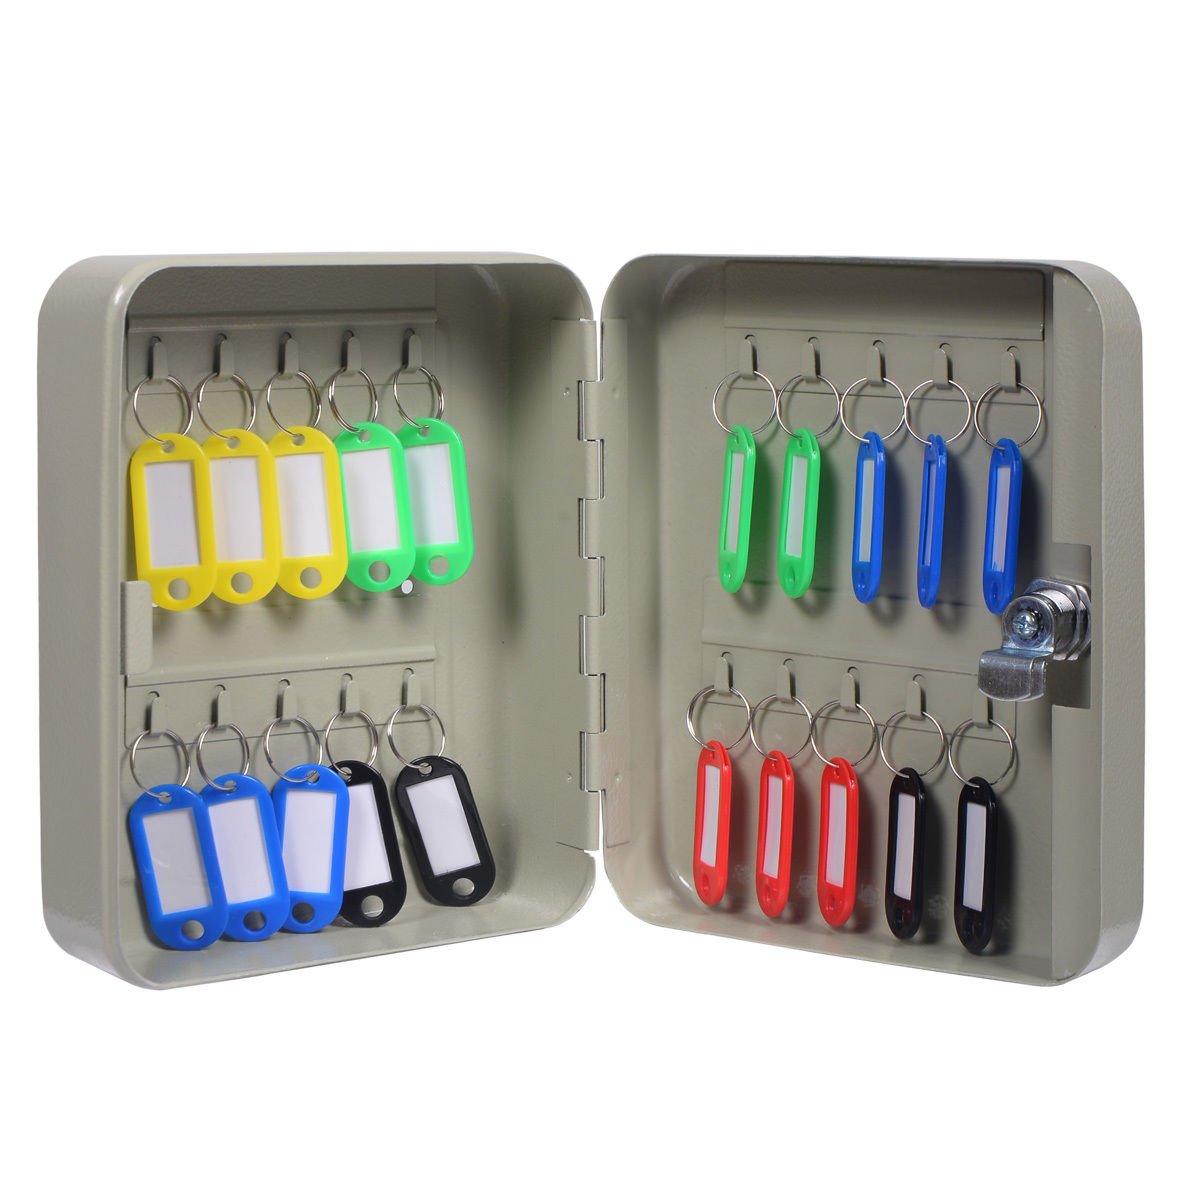 7.8'' Metal Gray Wall Mount Metal Key Box Storage w/ 20 Hook with Ebook